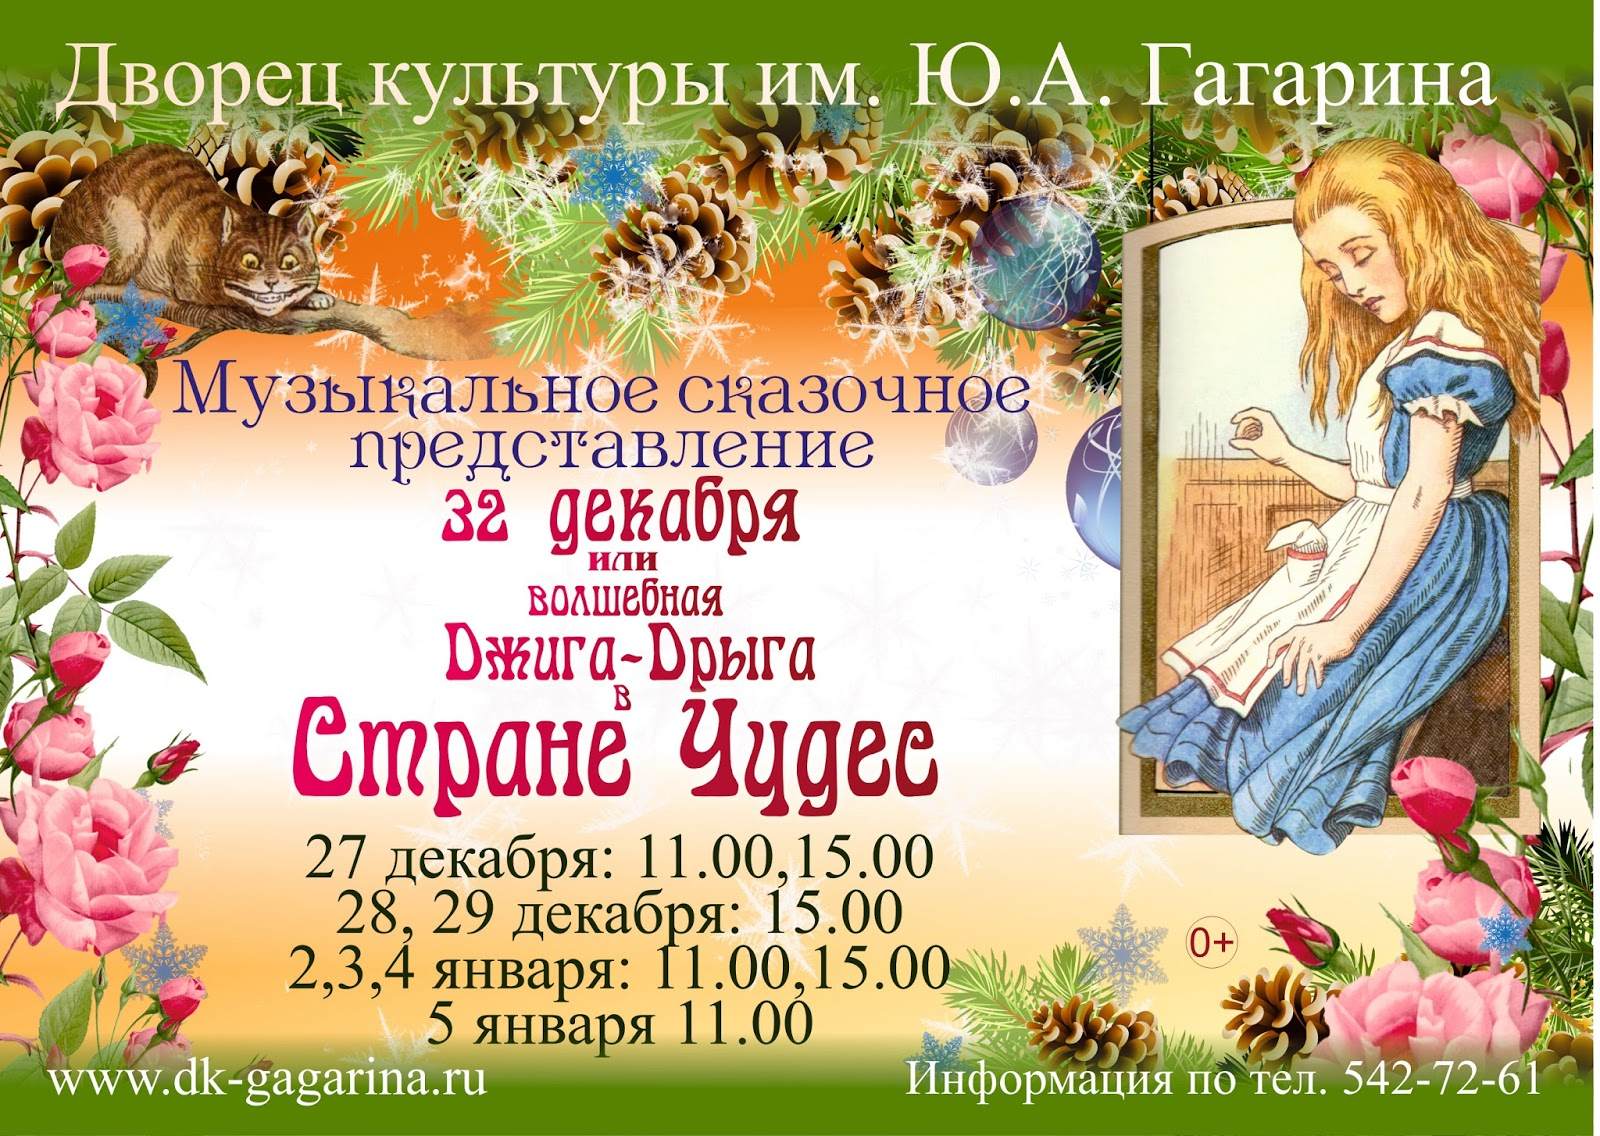 Дворец культуры им. Ю.А. Гагарина